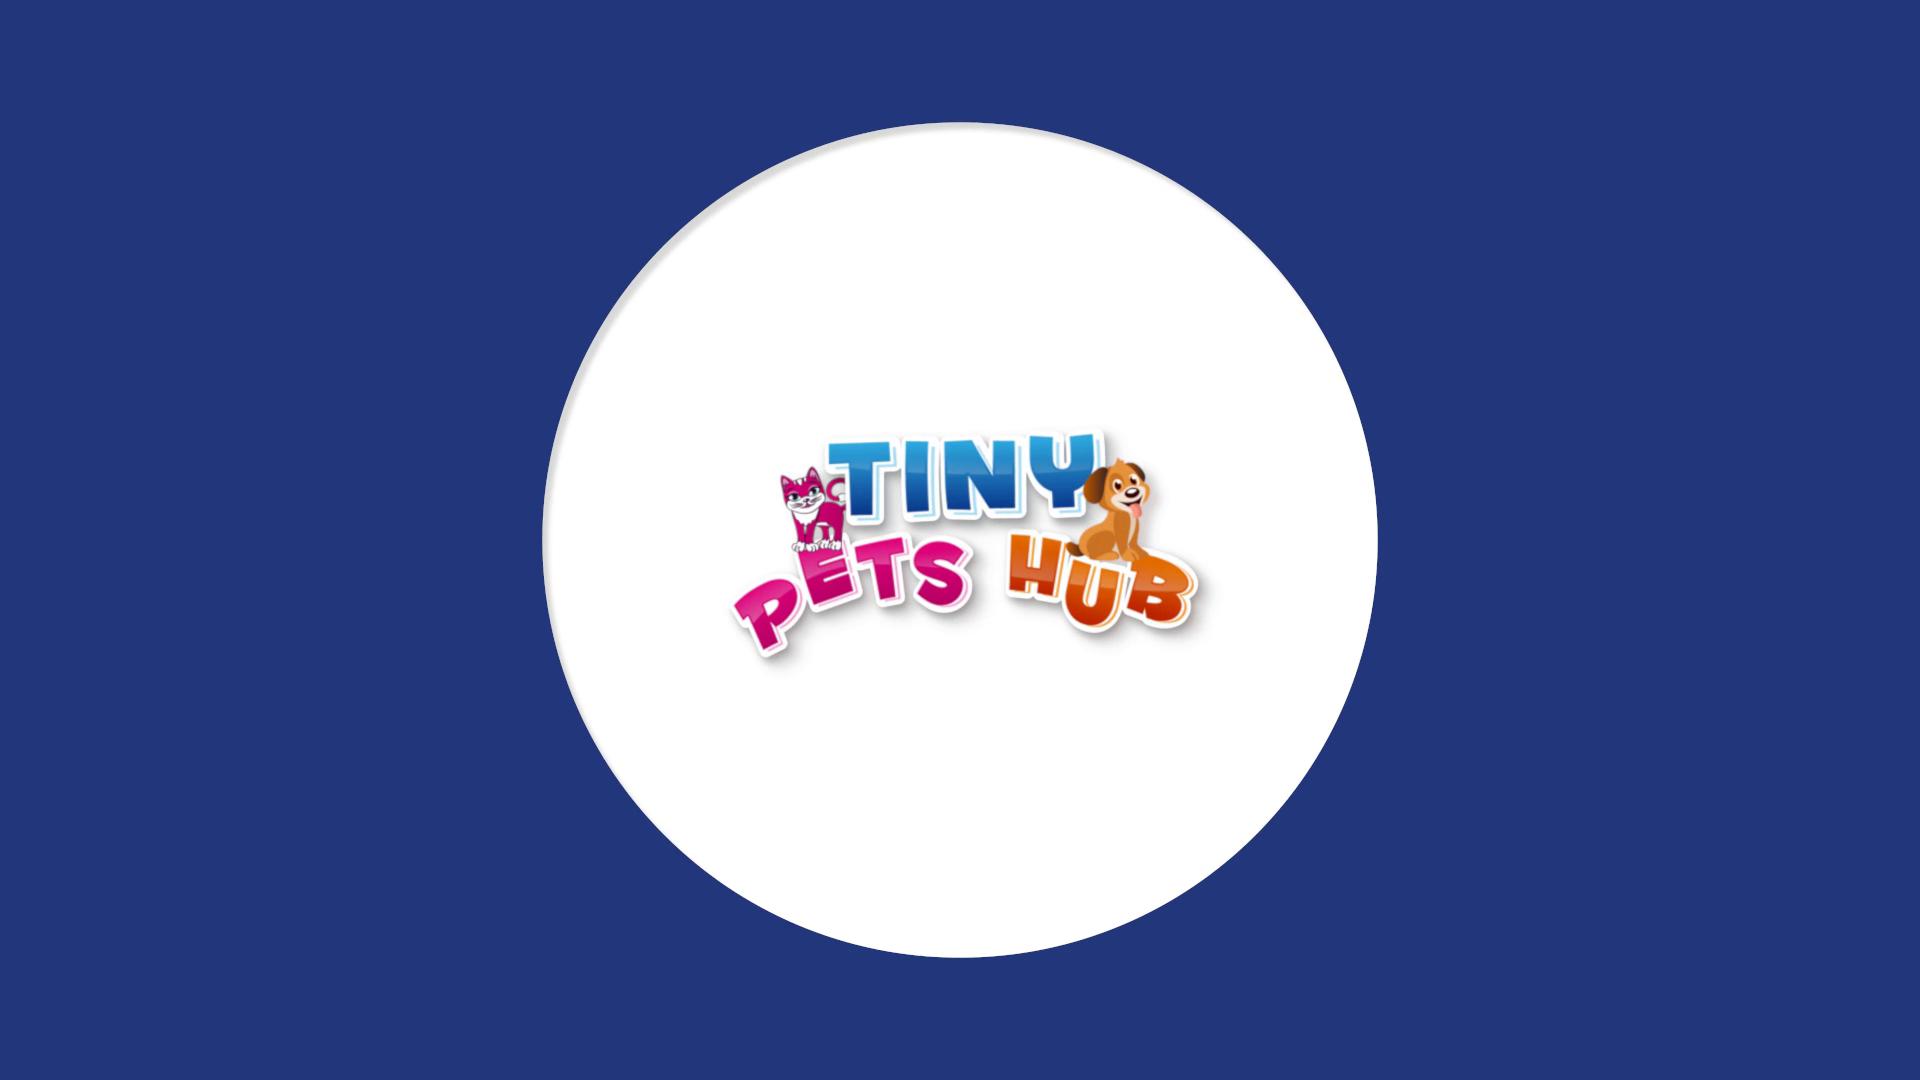 Bouncy Flat Logo Reveal for Tiny Pets Hub